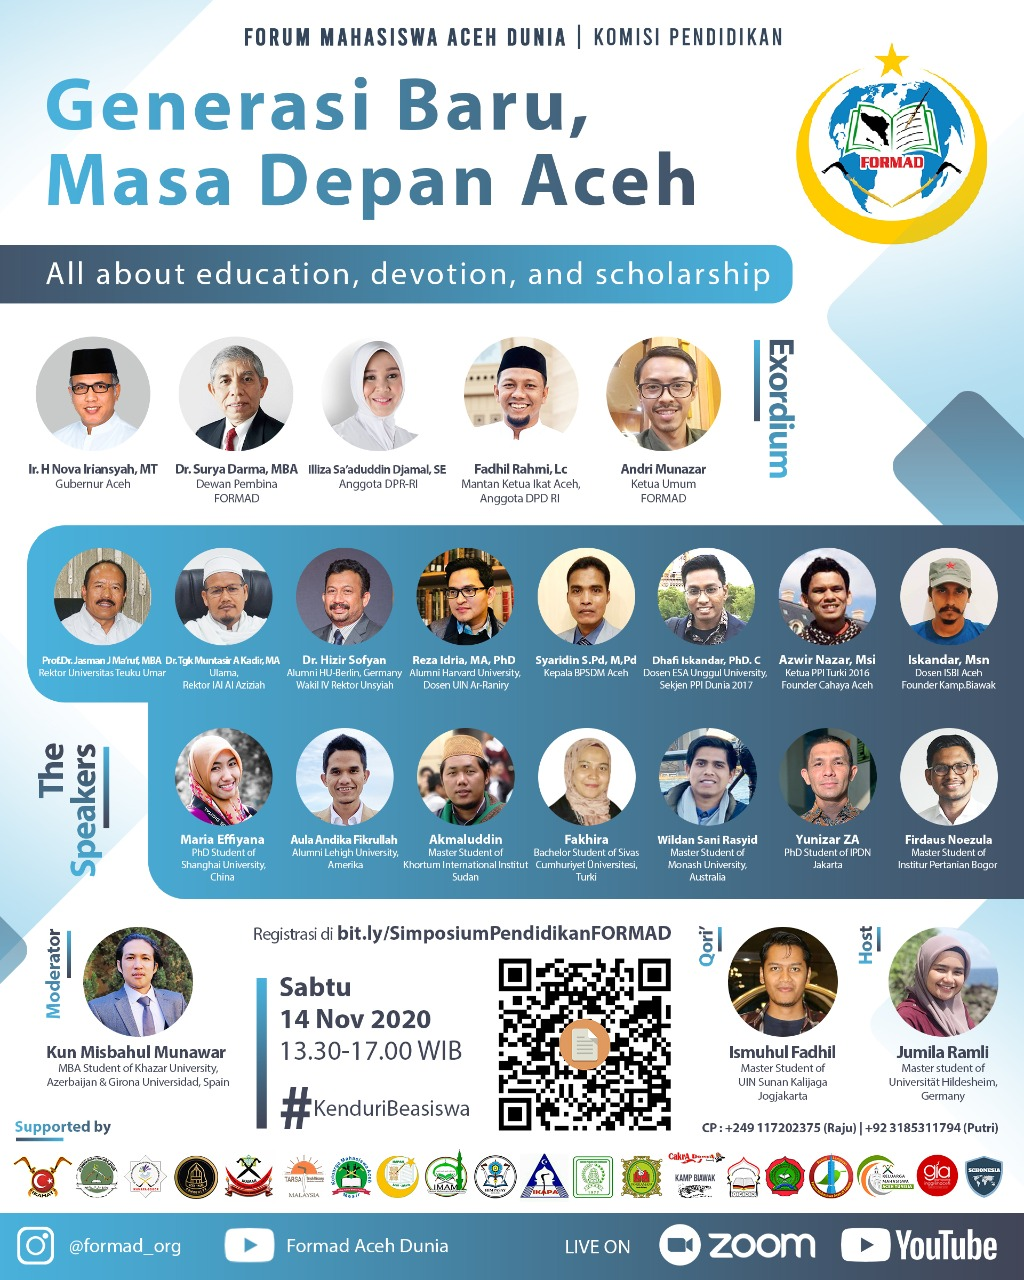 Forum Mahasiswa Aceh Dunia Gelar Kenduri Beasiswa